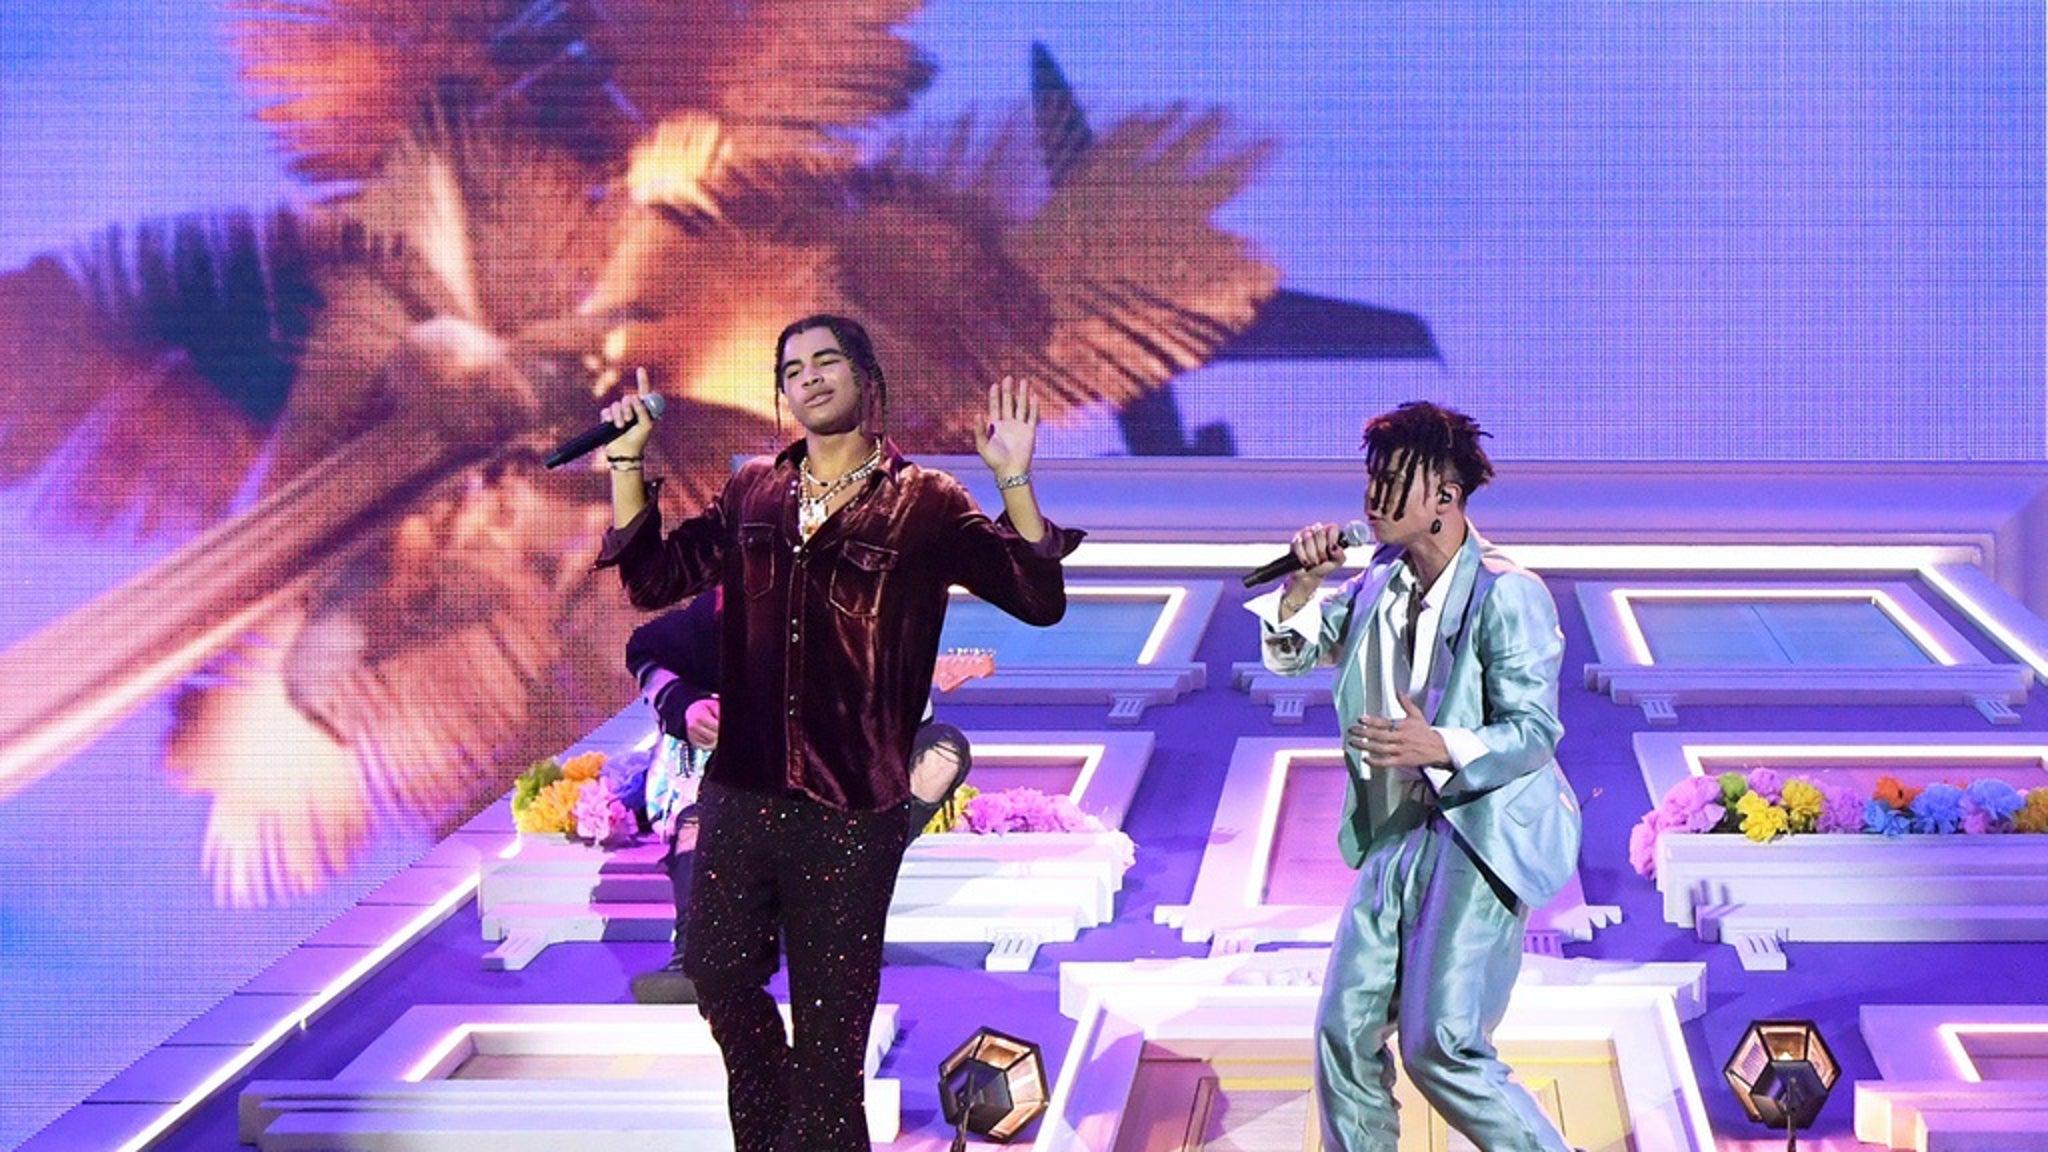 Inside The 2020 American Music Awards